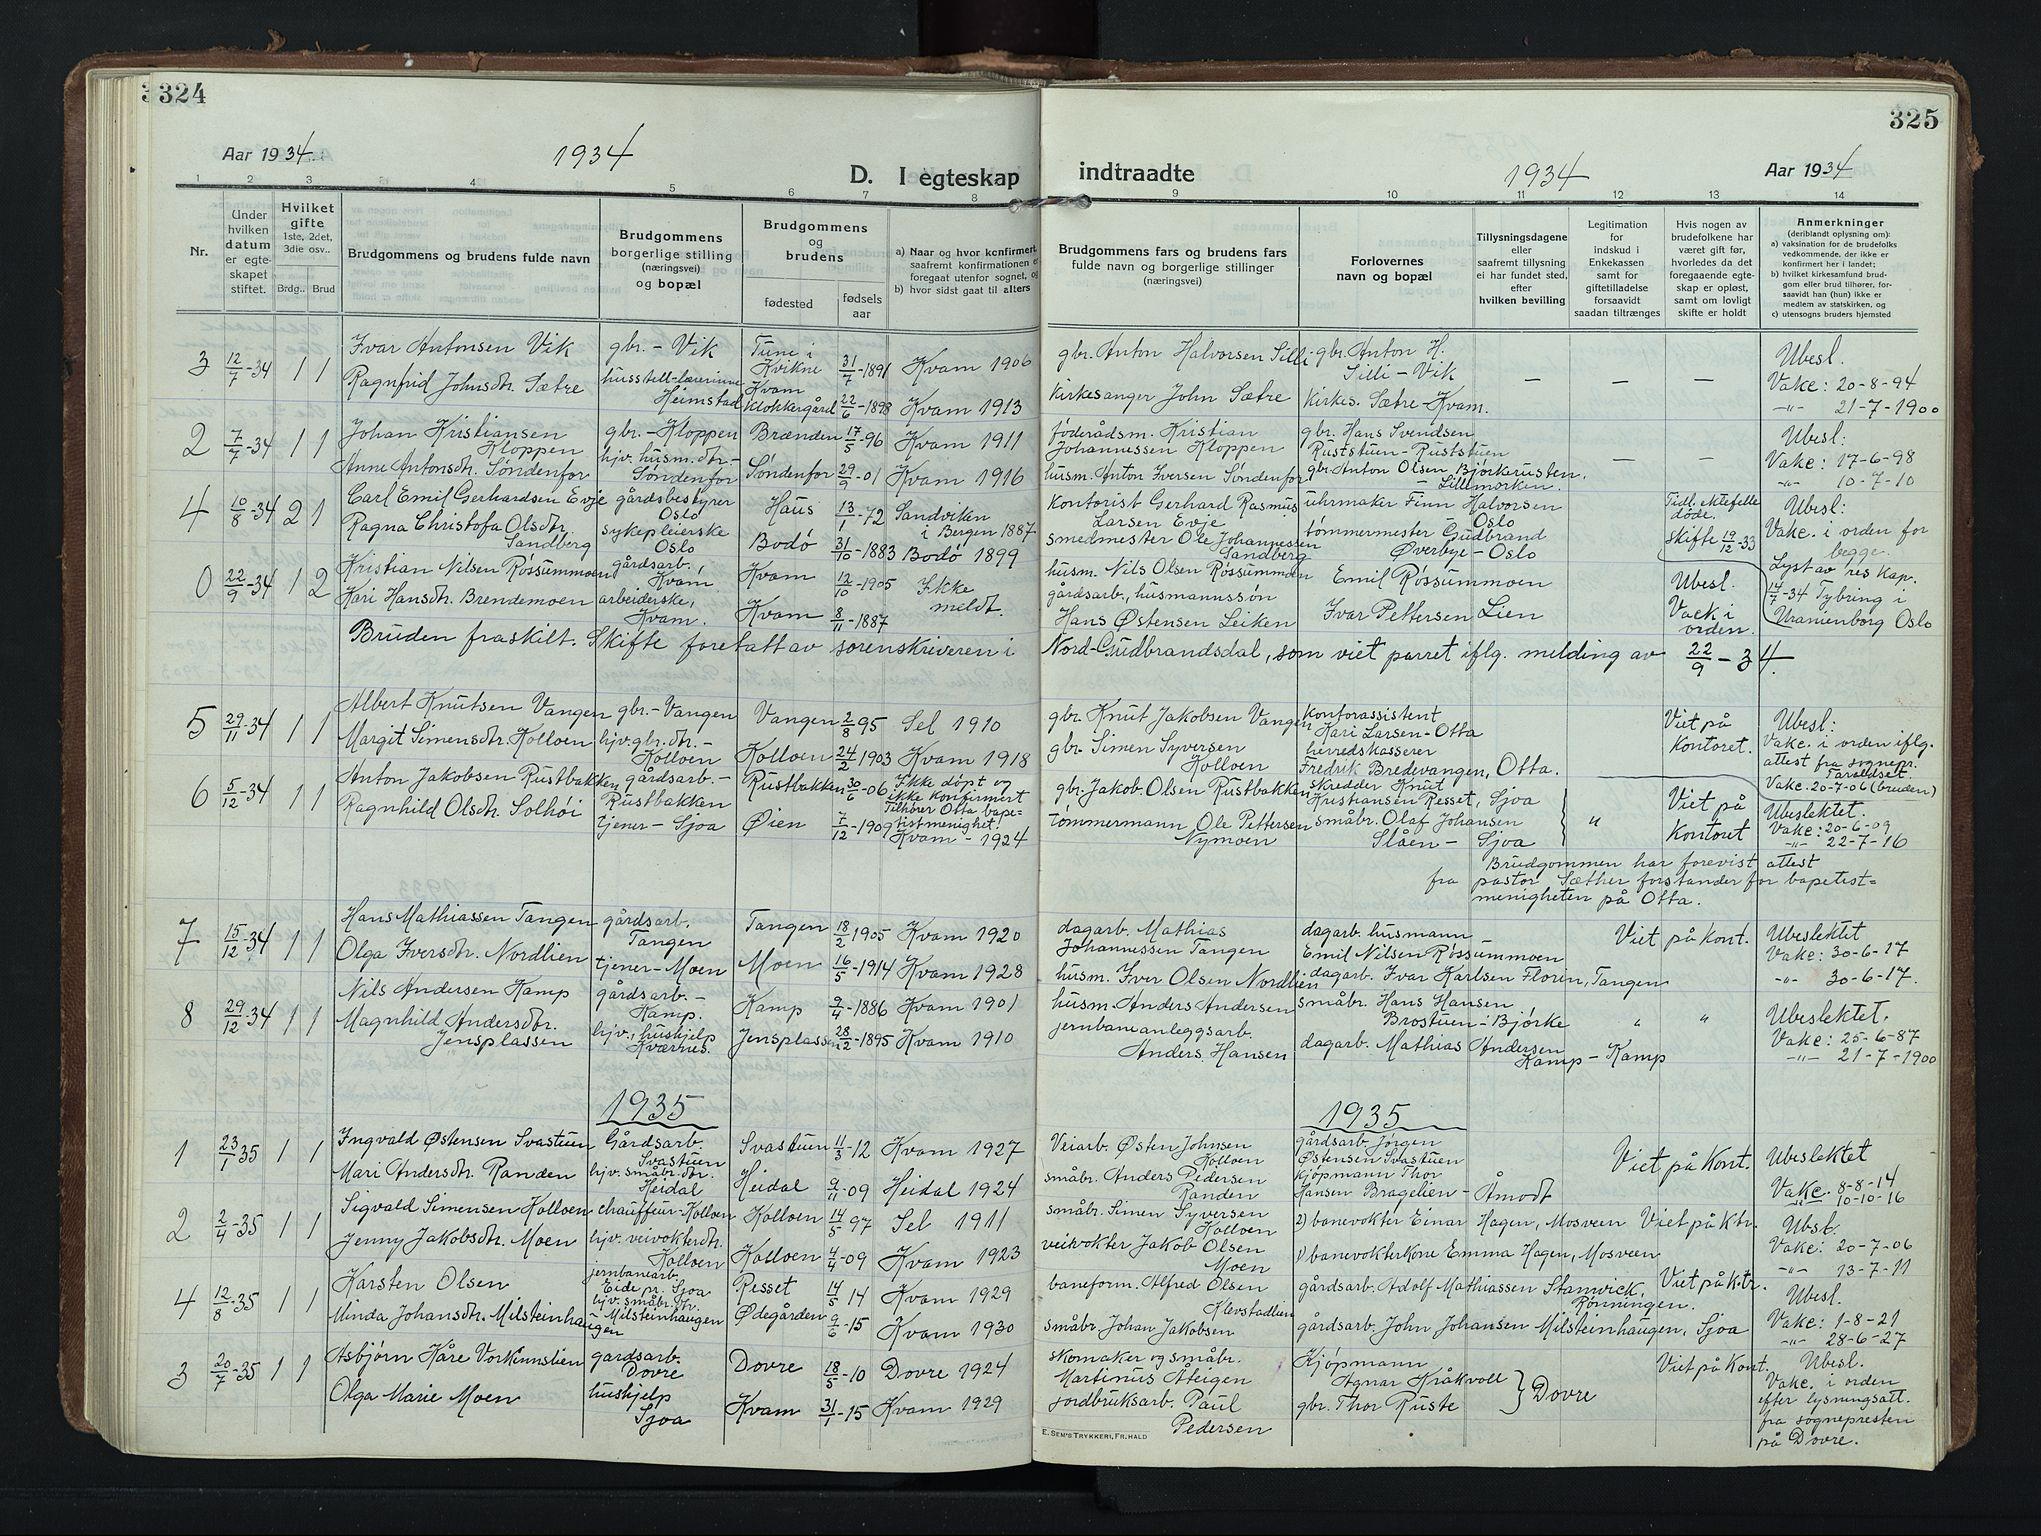 SAH, Nord-Fron prestekontor, Klokkerbok nr. 8, 1915-1948, s. 324-325